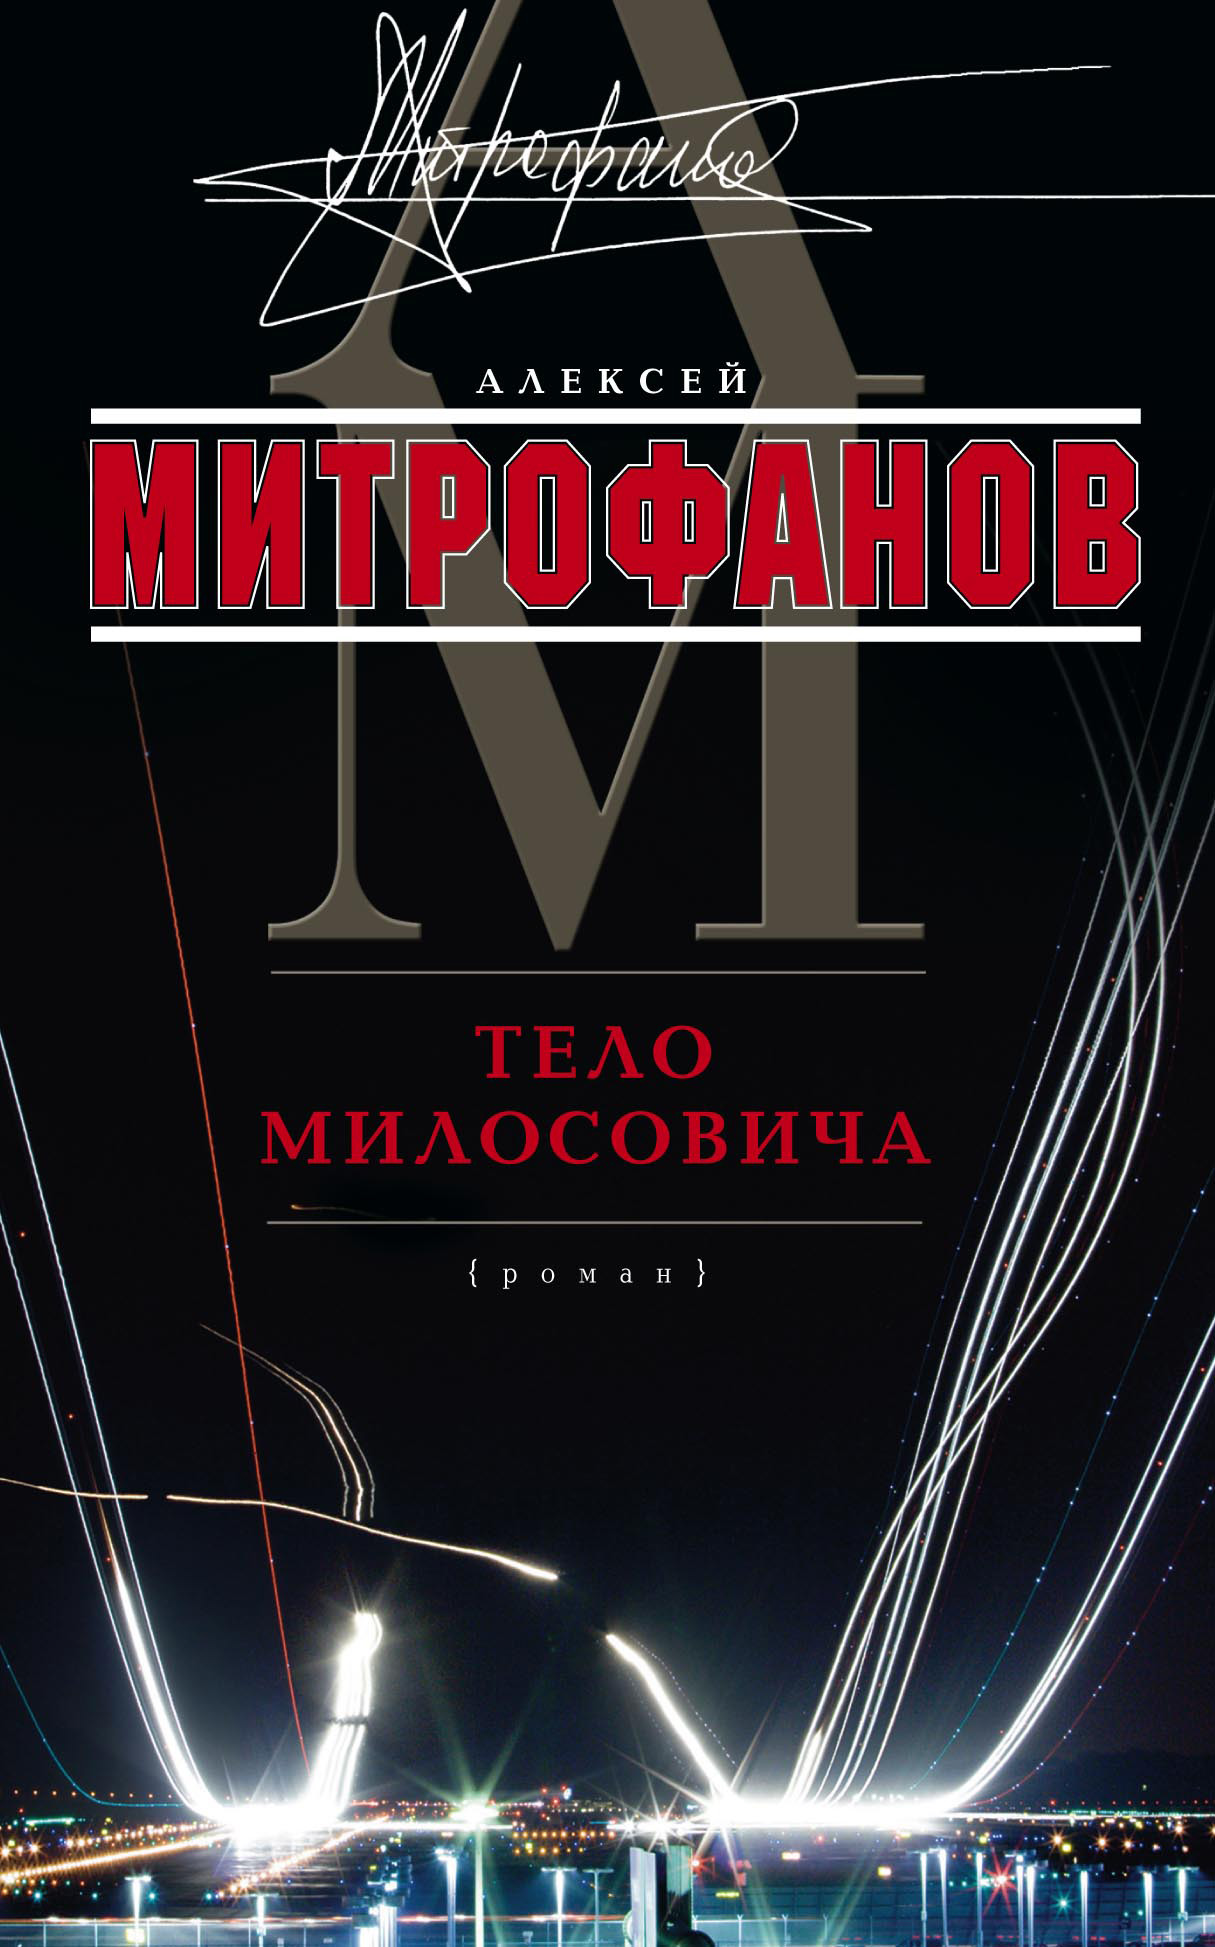 Алексей Митрофанов «Тело Милосовича»